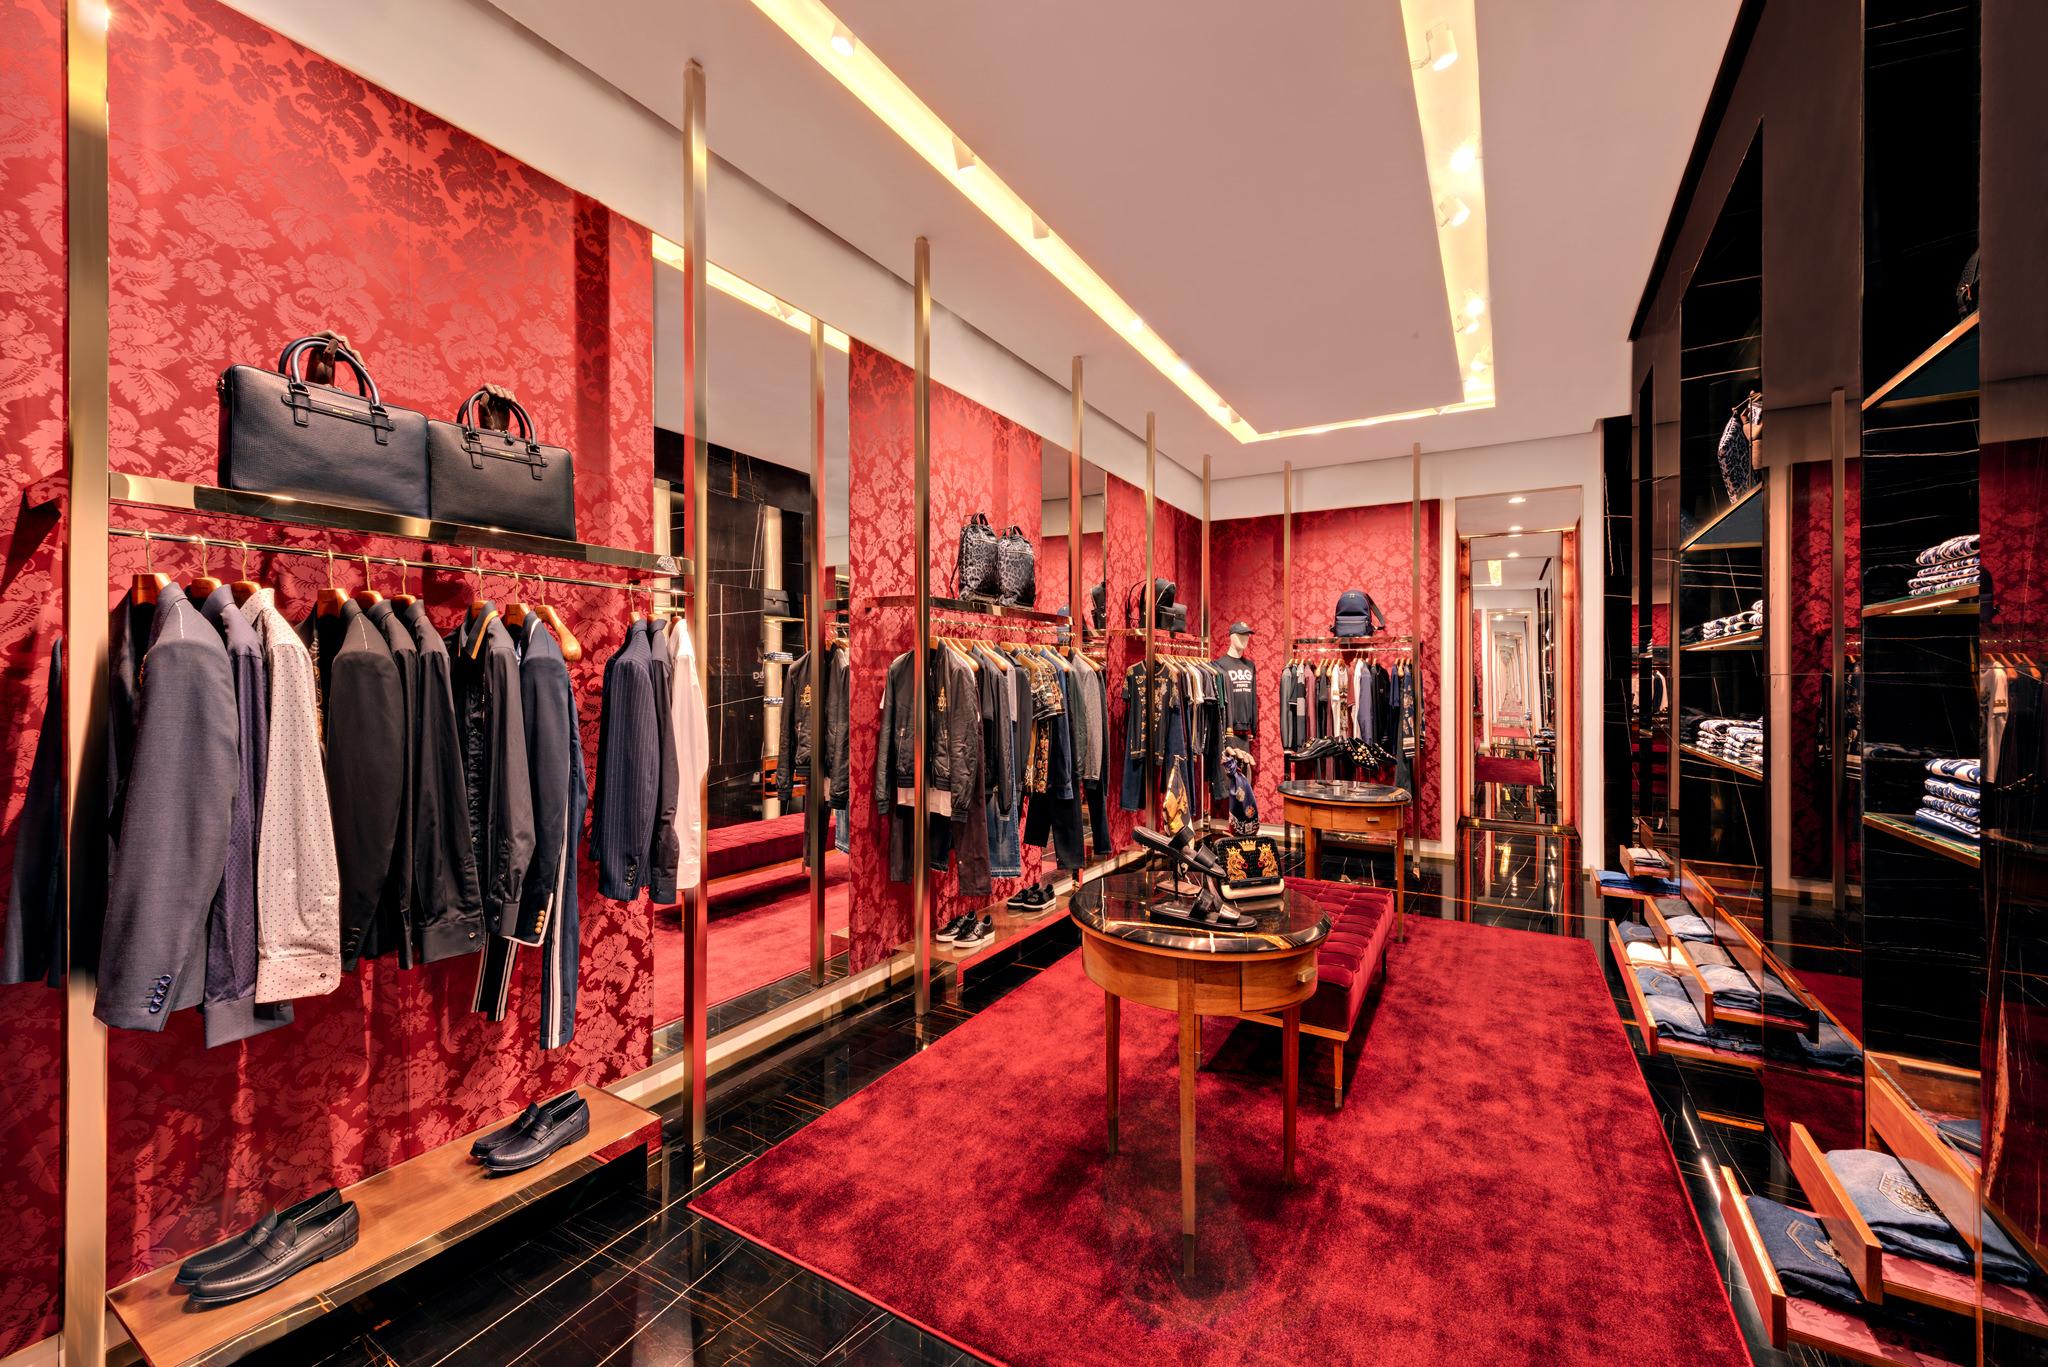 20171011 - Dolce & Gabbana - HCM - Commercial - Interior - Store - Retouch 0064.jpg